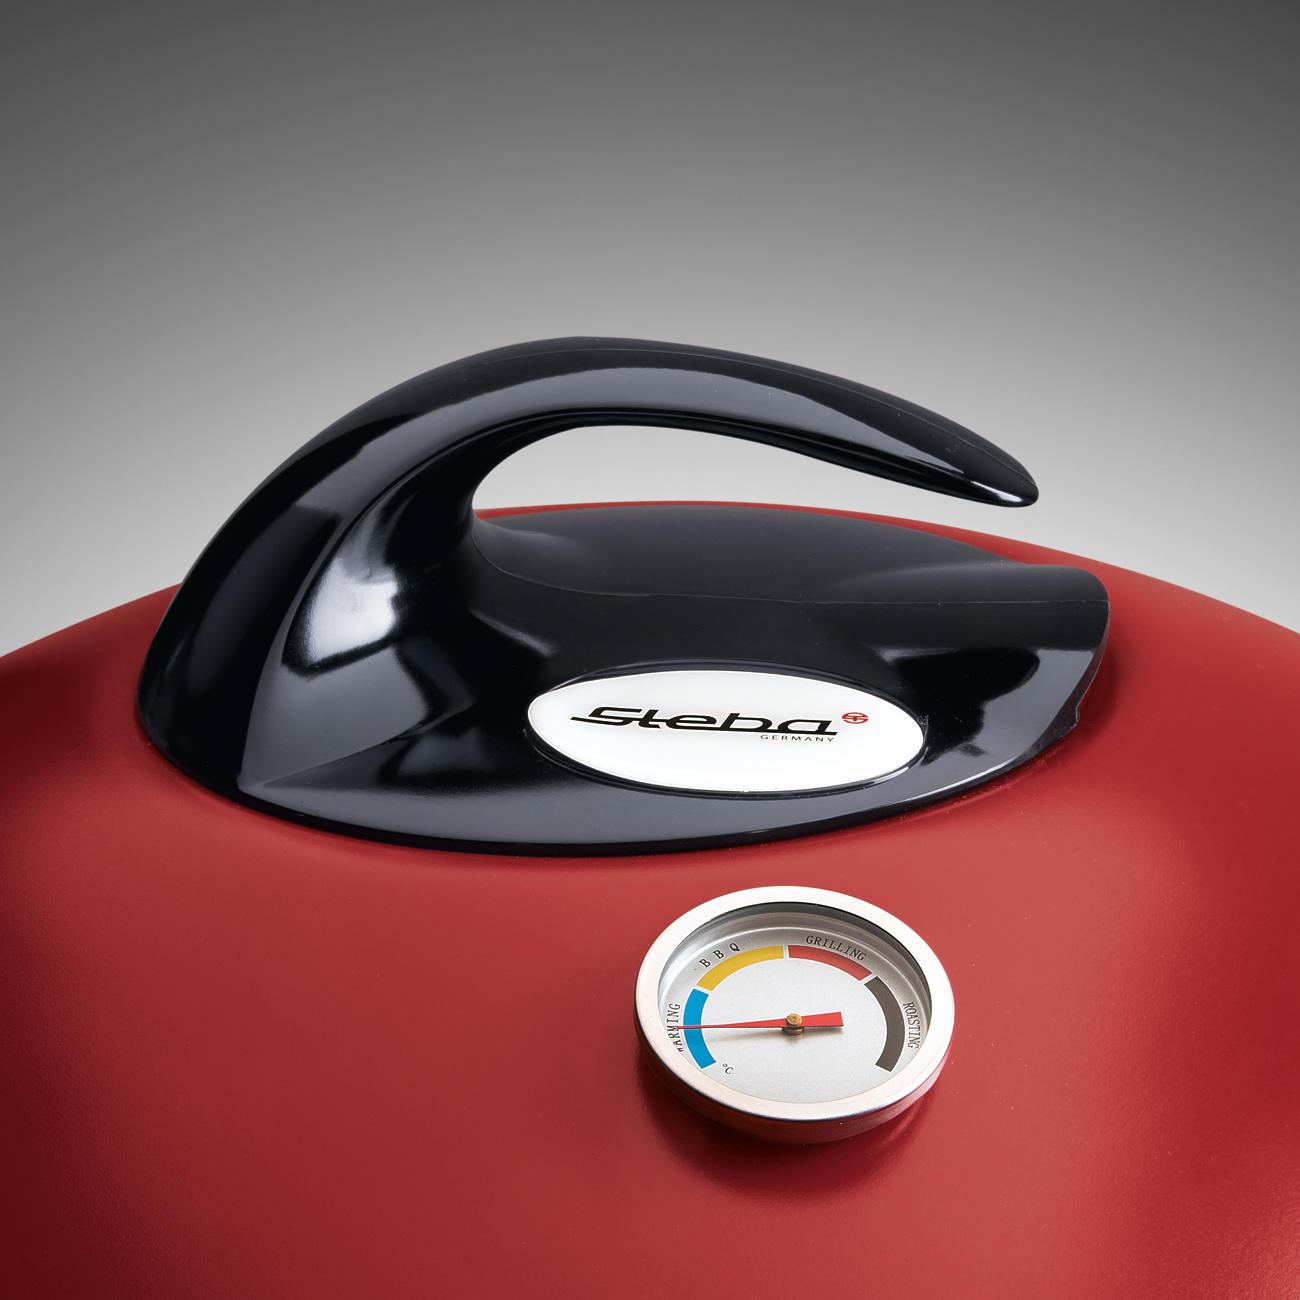 barbecue elektrogrill 3 jahre garantie pro idee. Black Bedroom Furniture Sets. Home Design Ideas